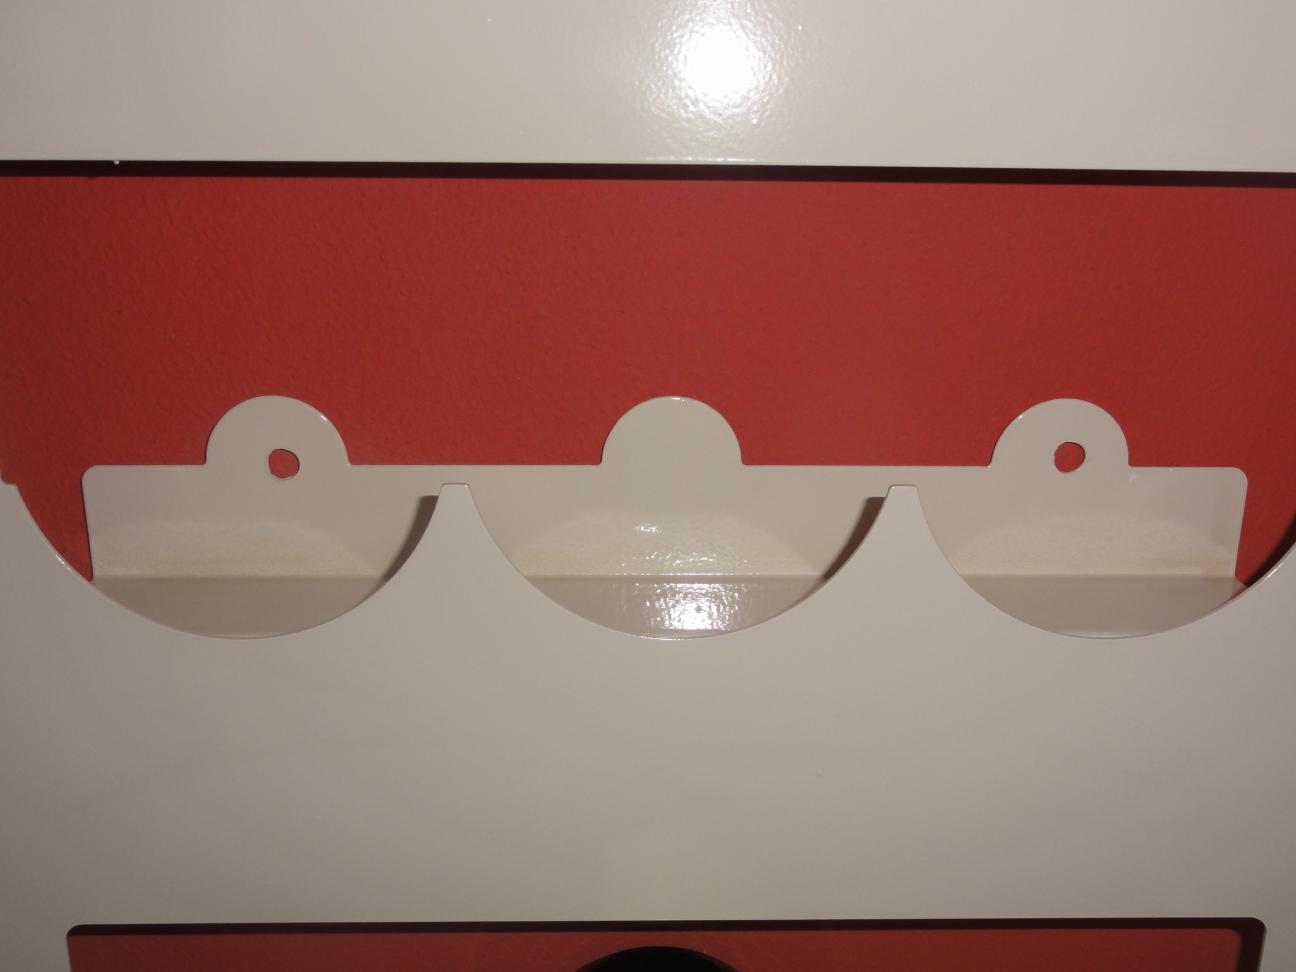 weinregal f r 6 flaschen aus metall design h nge regal farbe nach farbkarte. Black Bedroom Furniture Sets. Home Design Ideas